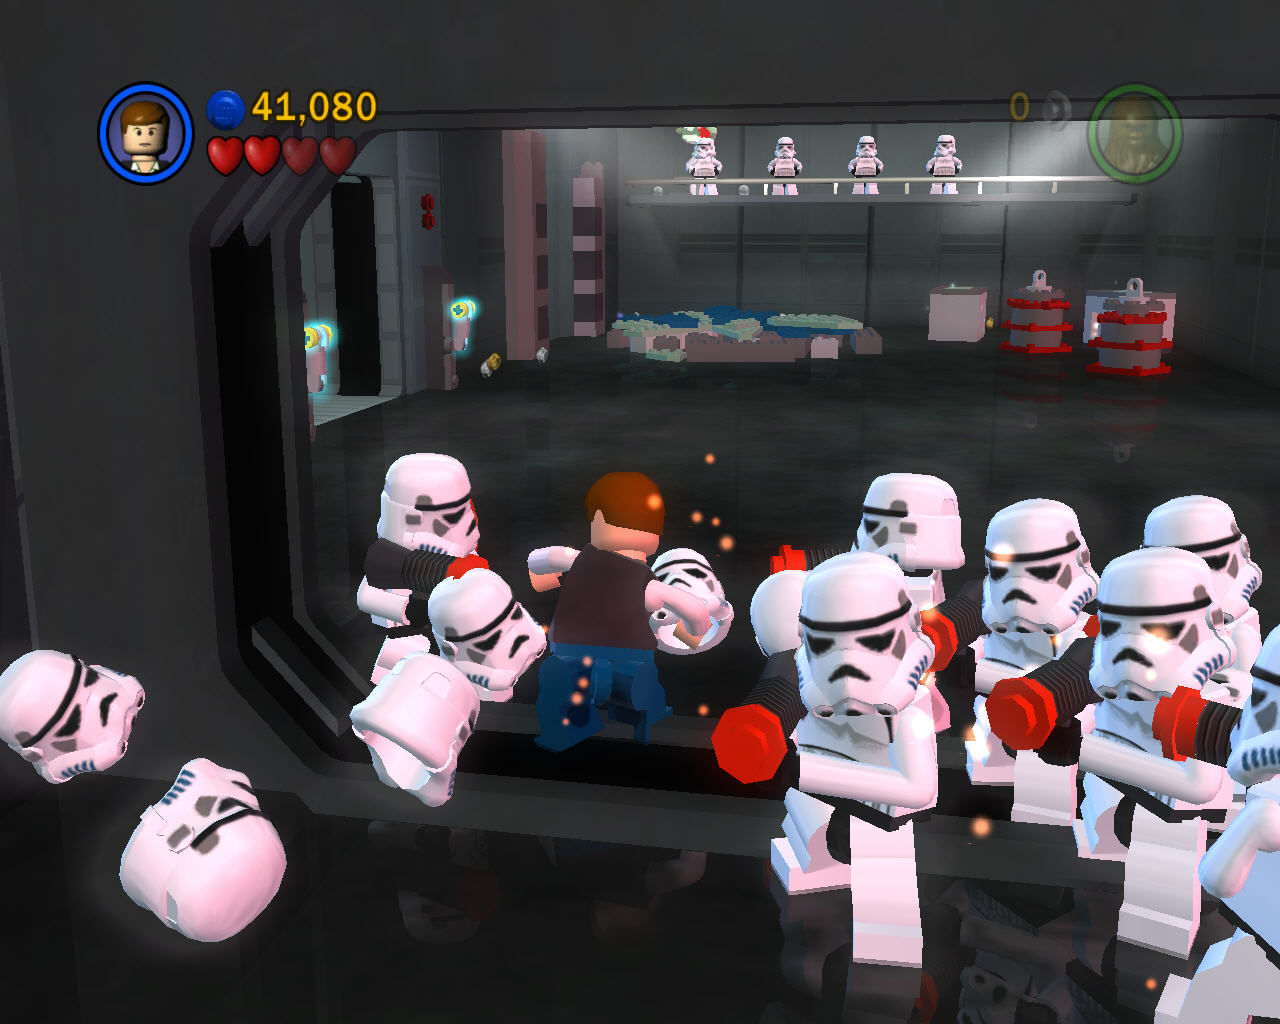 Lego Star Wars Ii The Original Trilogy Video Game 2006 Photo Gallery Imdb